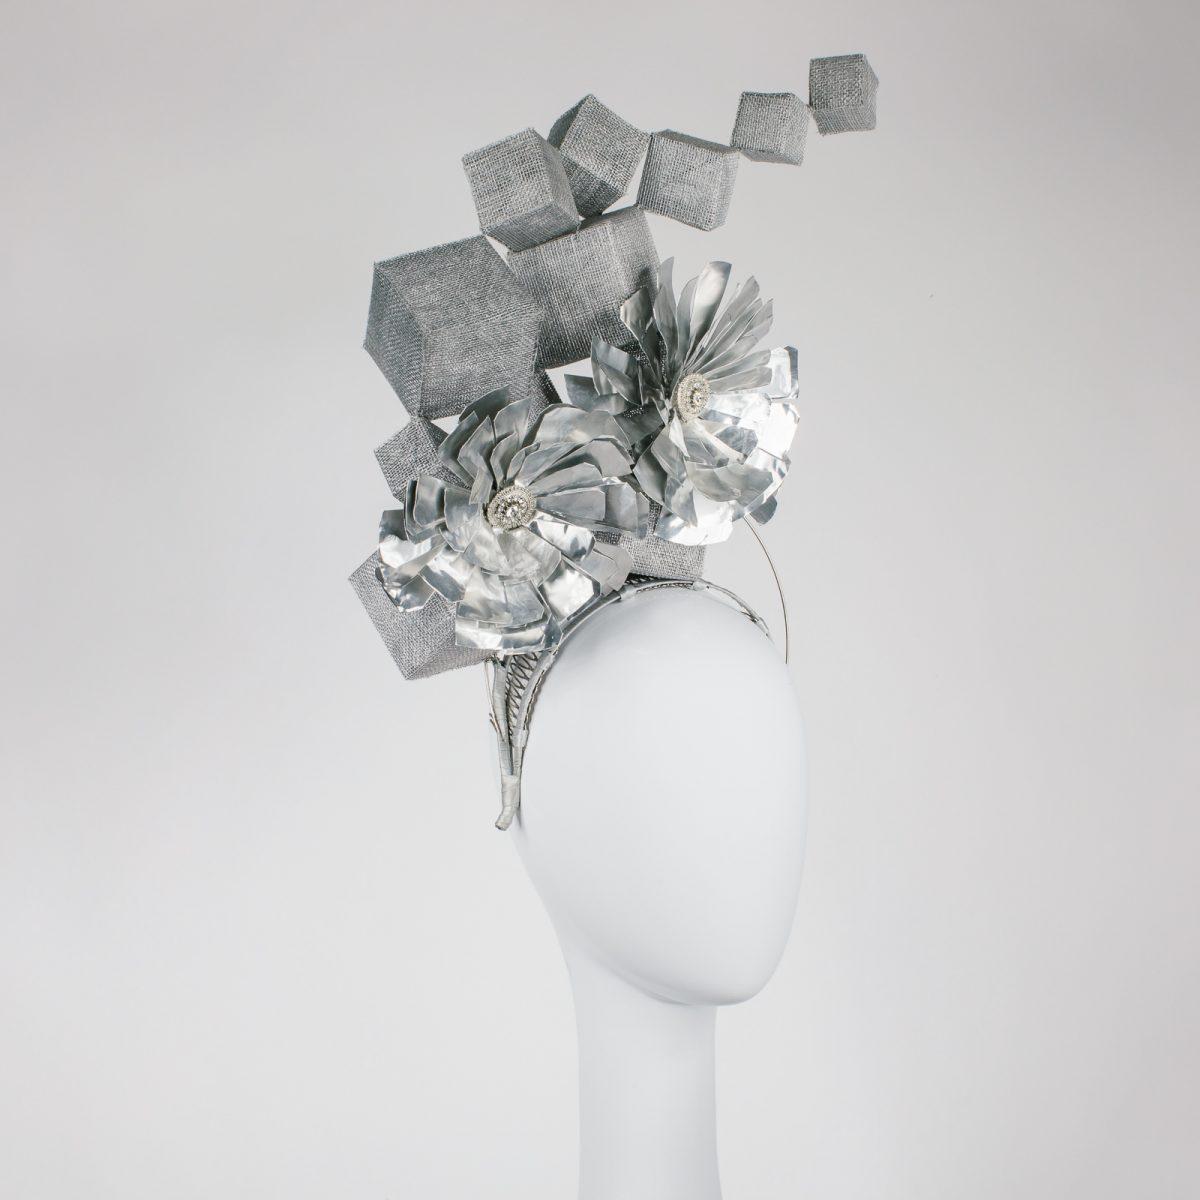 metal millinery hat - award piece - ftof millinery award